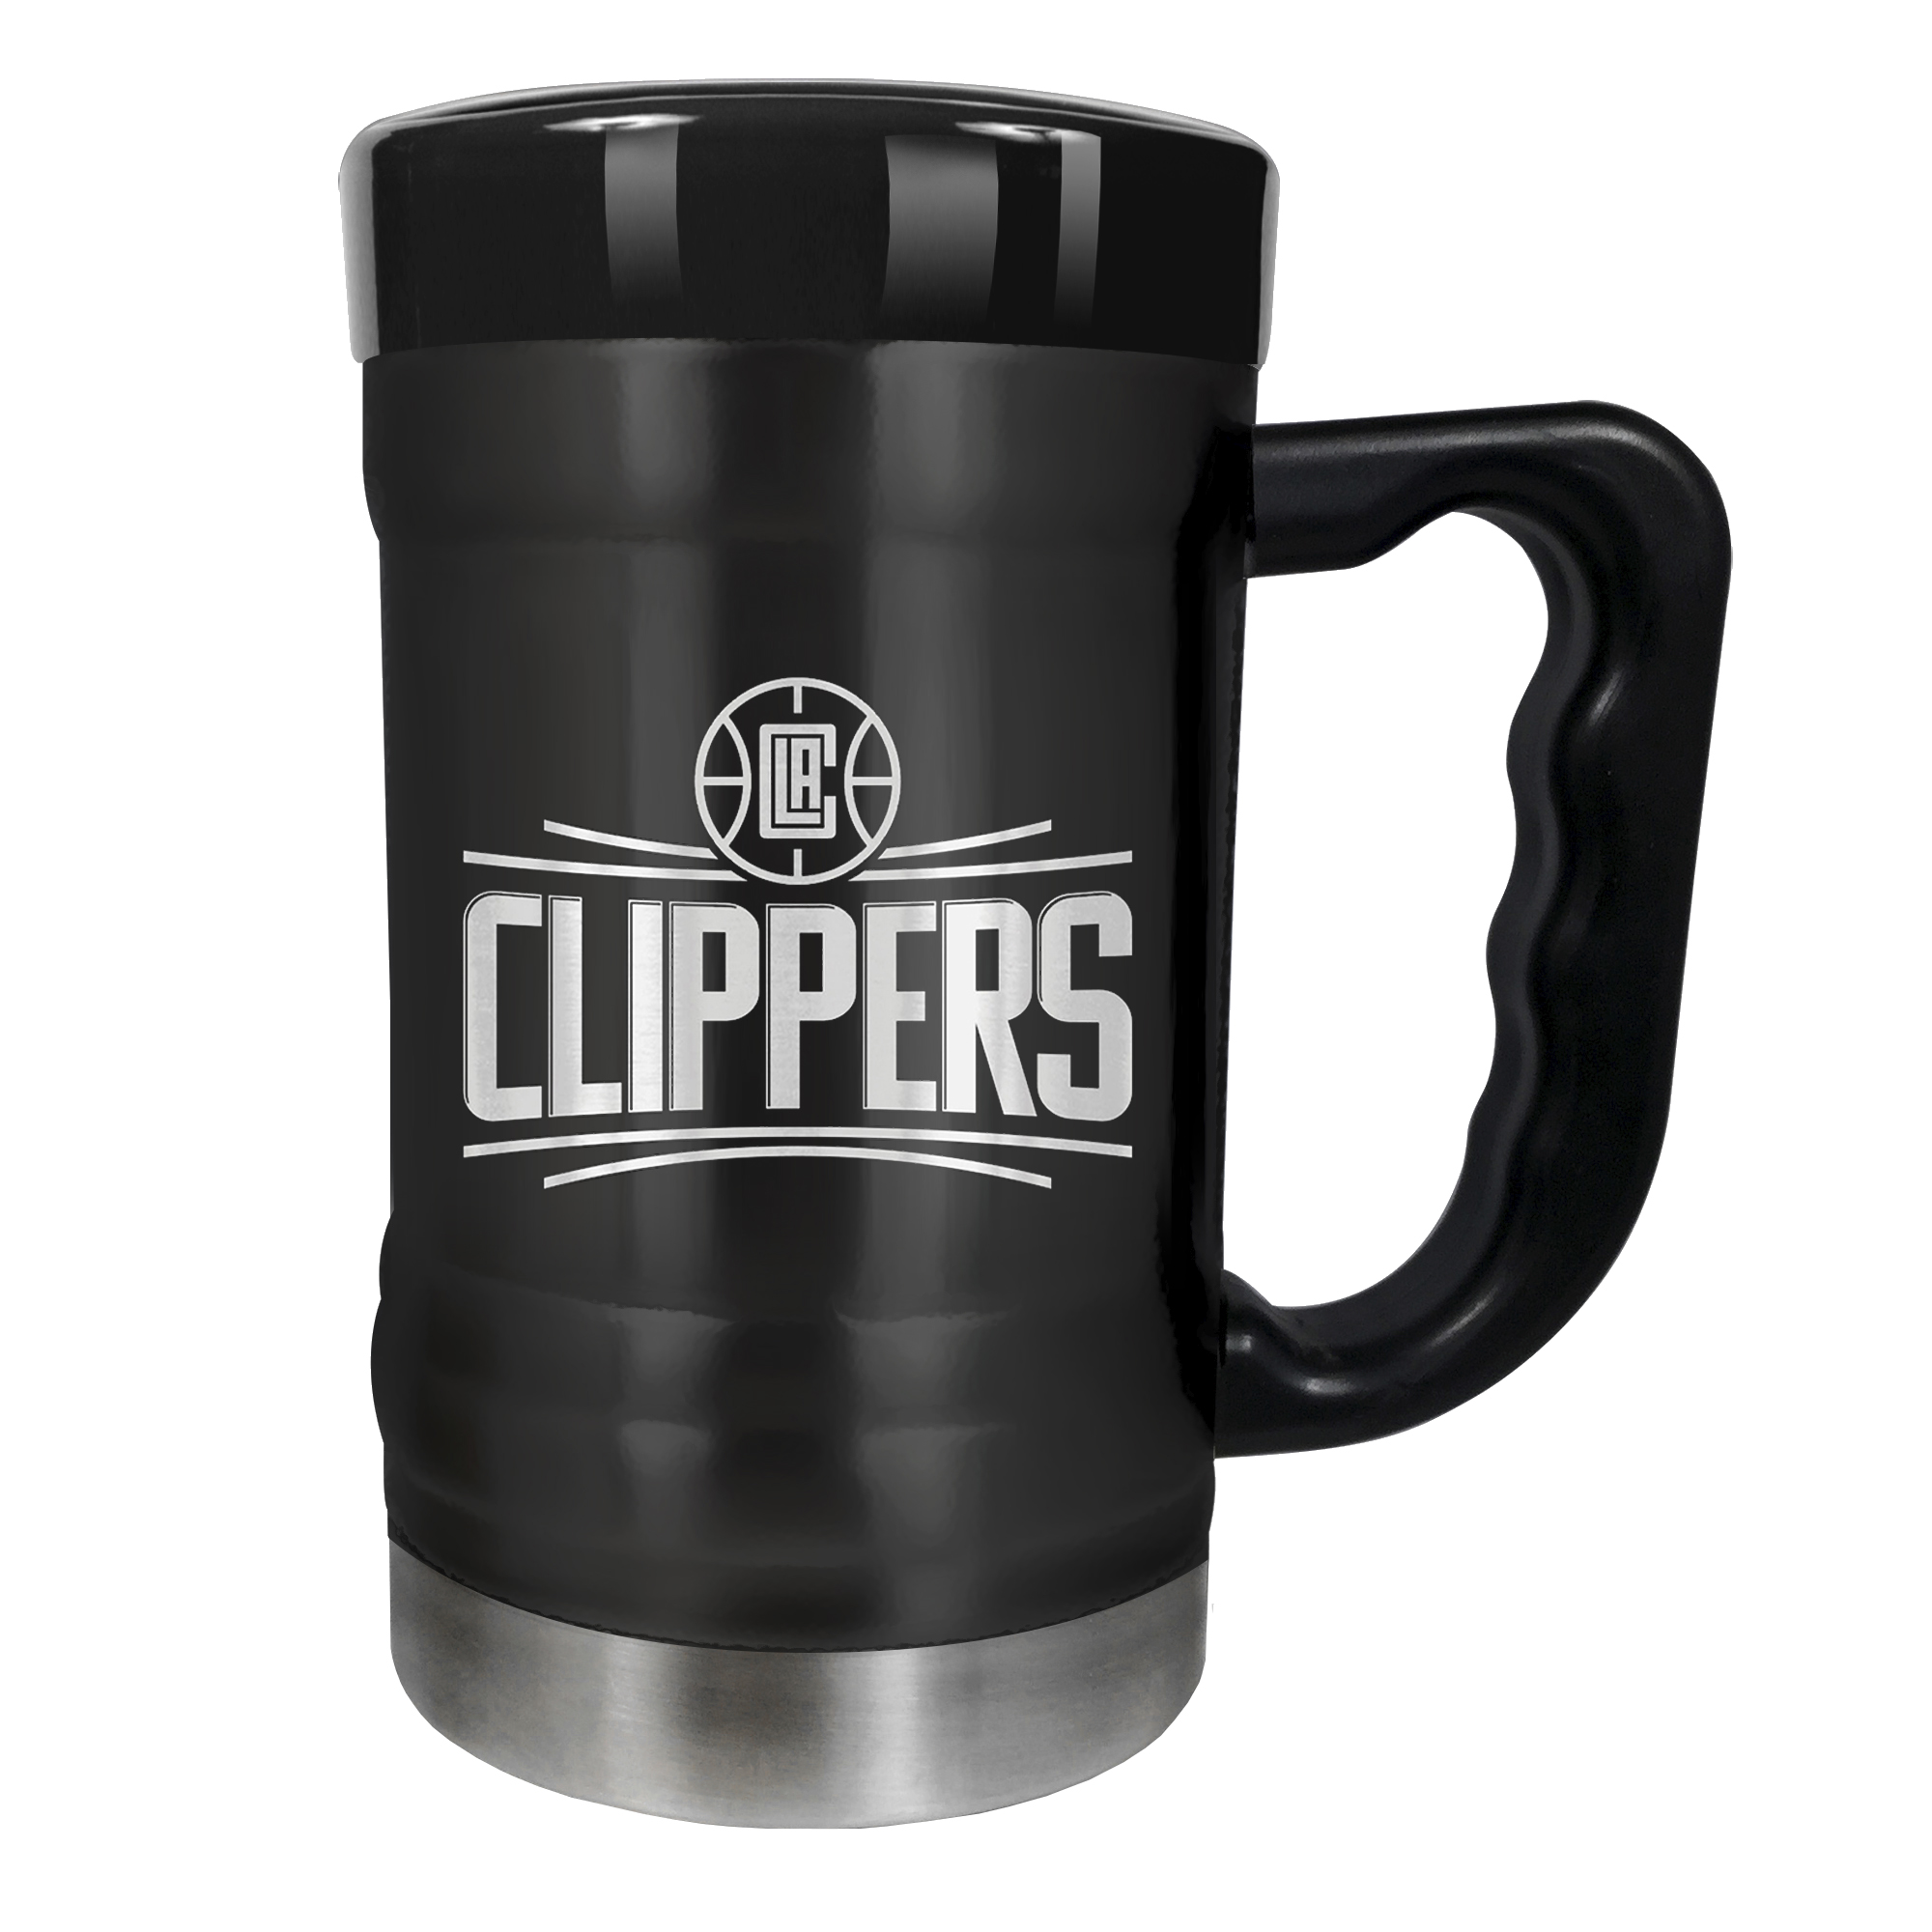 LA Clippers 15oz. Stealth Coach Coffee Mug - Black - No Size